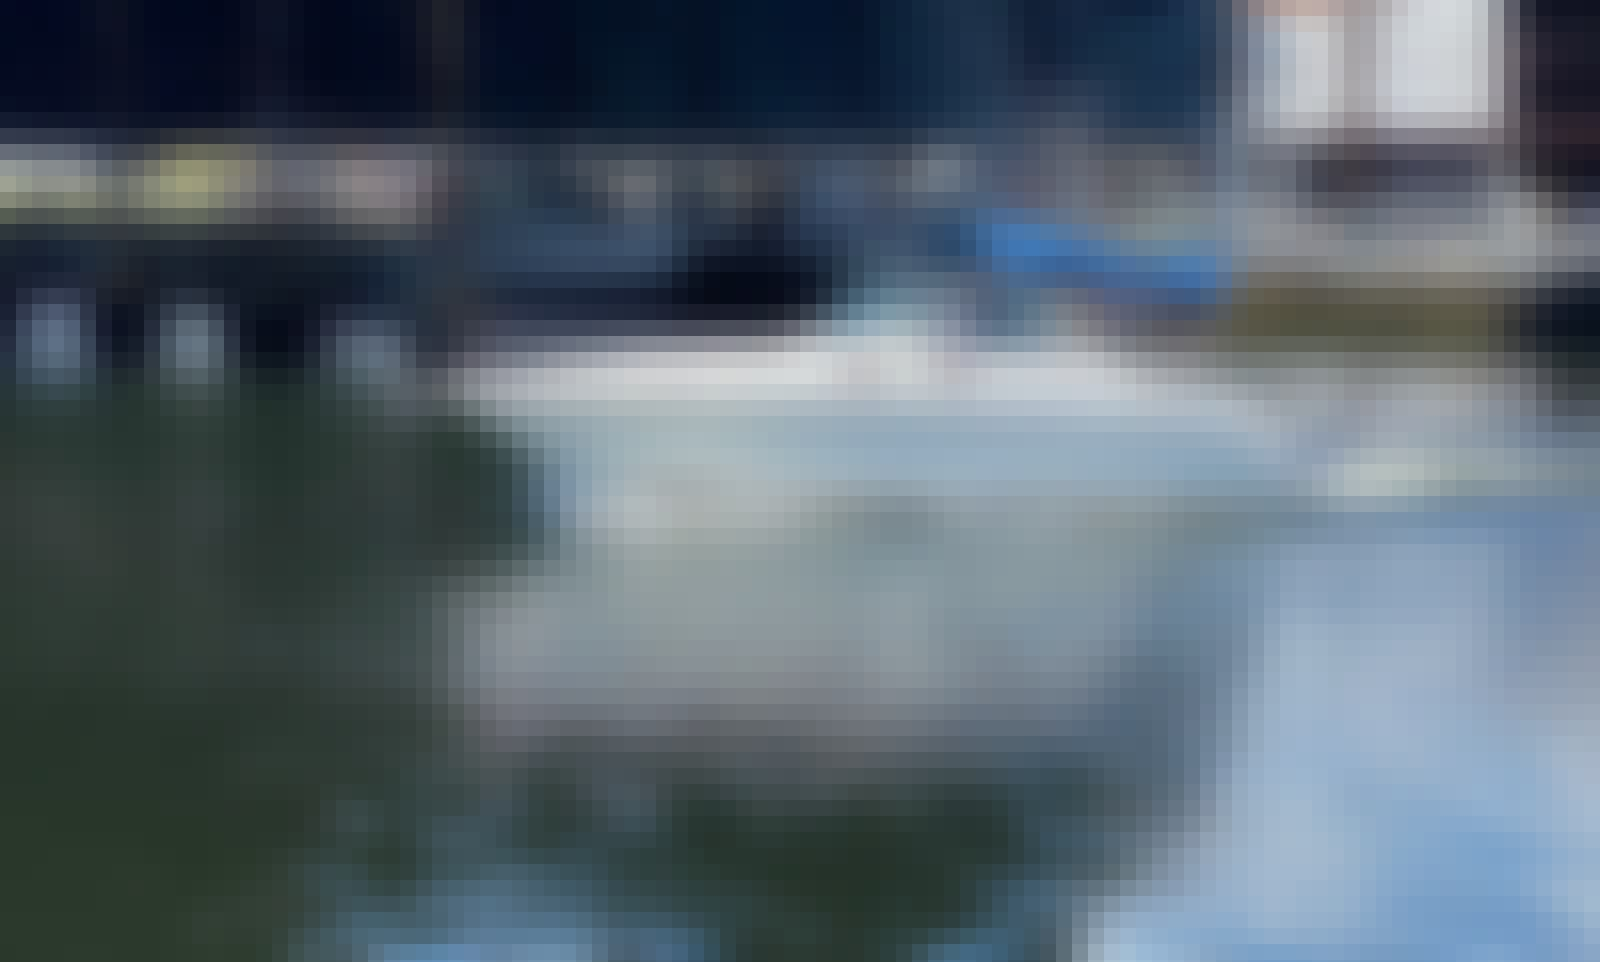 Sea Ray Sundancer 30' for Charter in Miami, Florida!